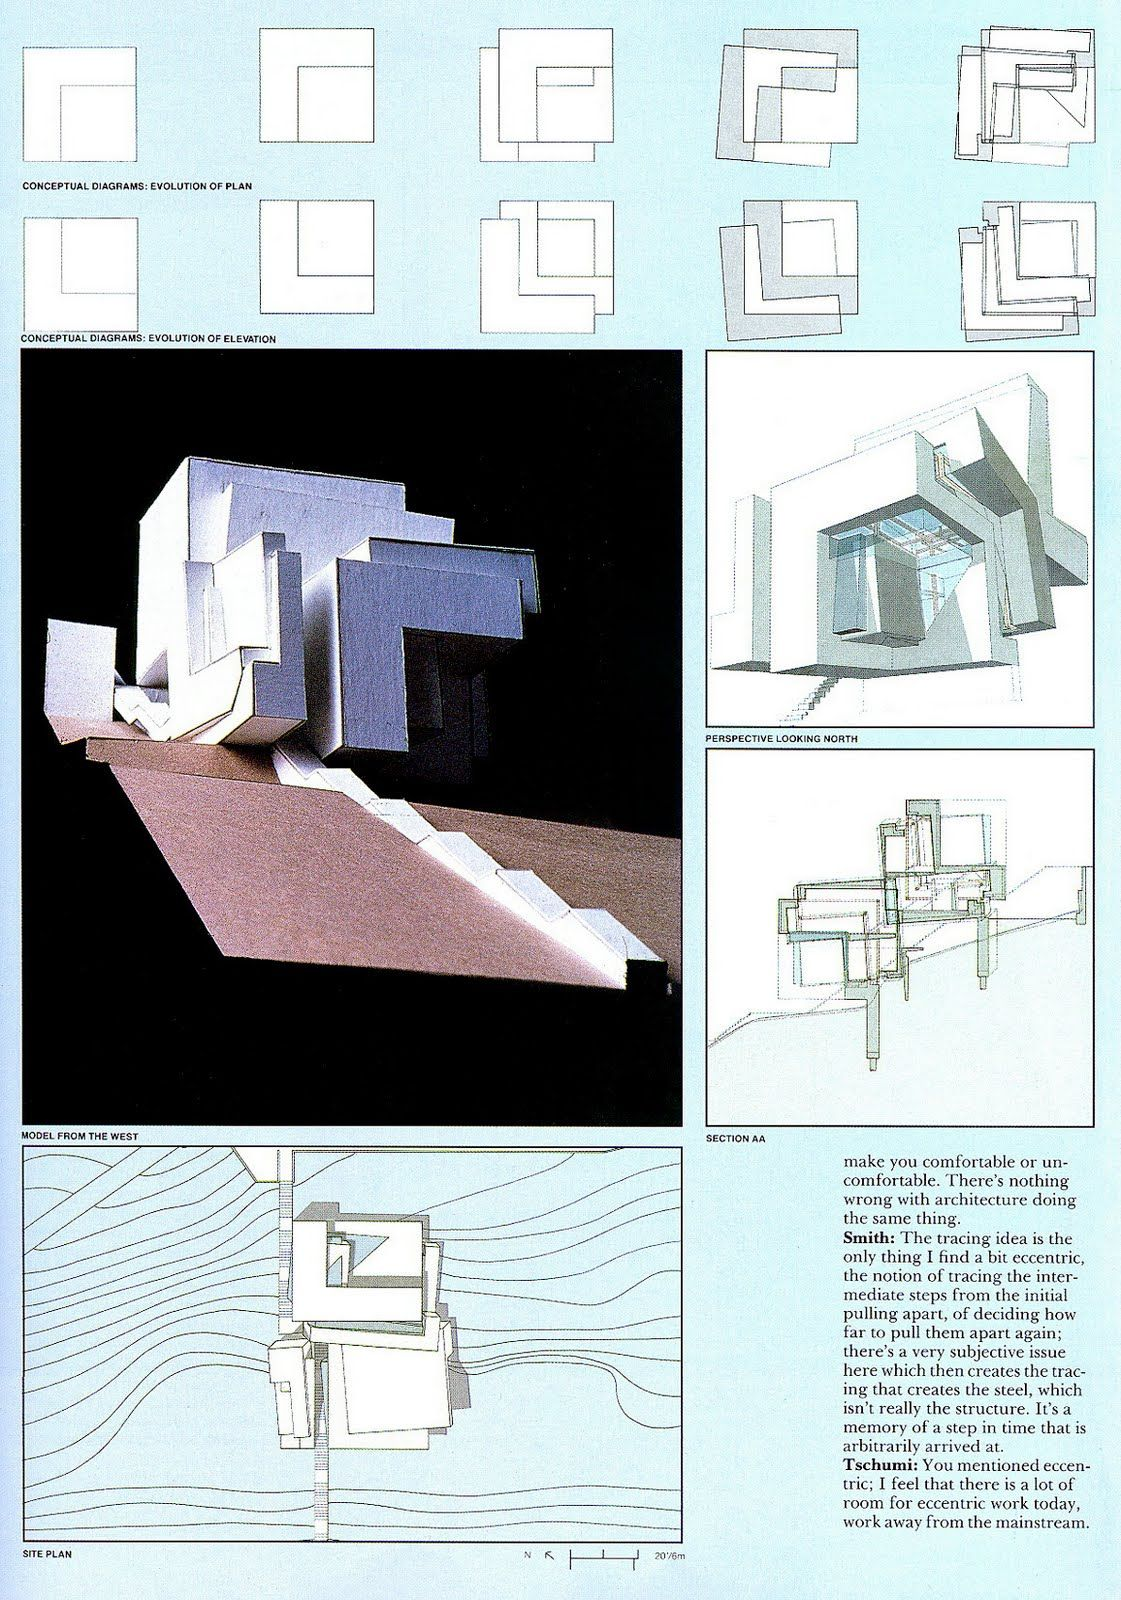 House Plan 1519 Compact Living Don Gardner House Plans Simple Floor Plans Drawing House Plans House Plans